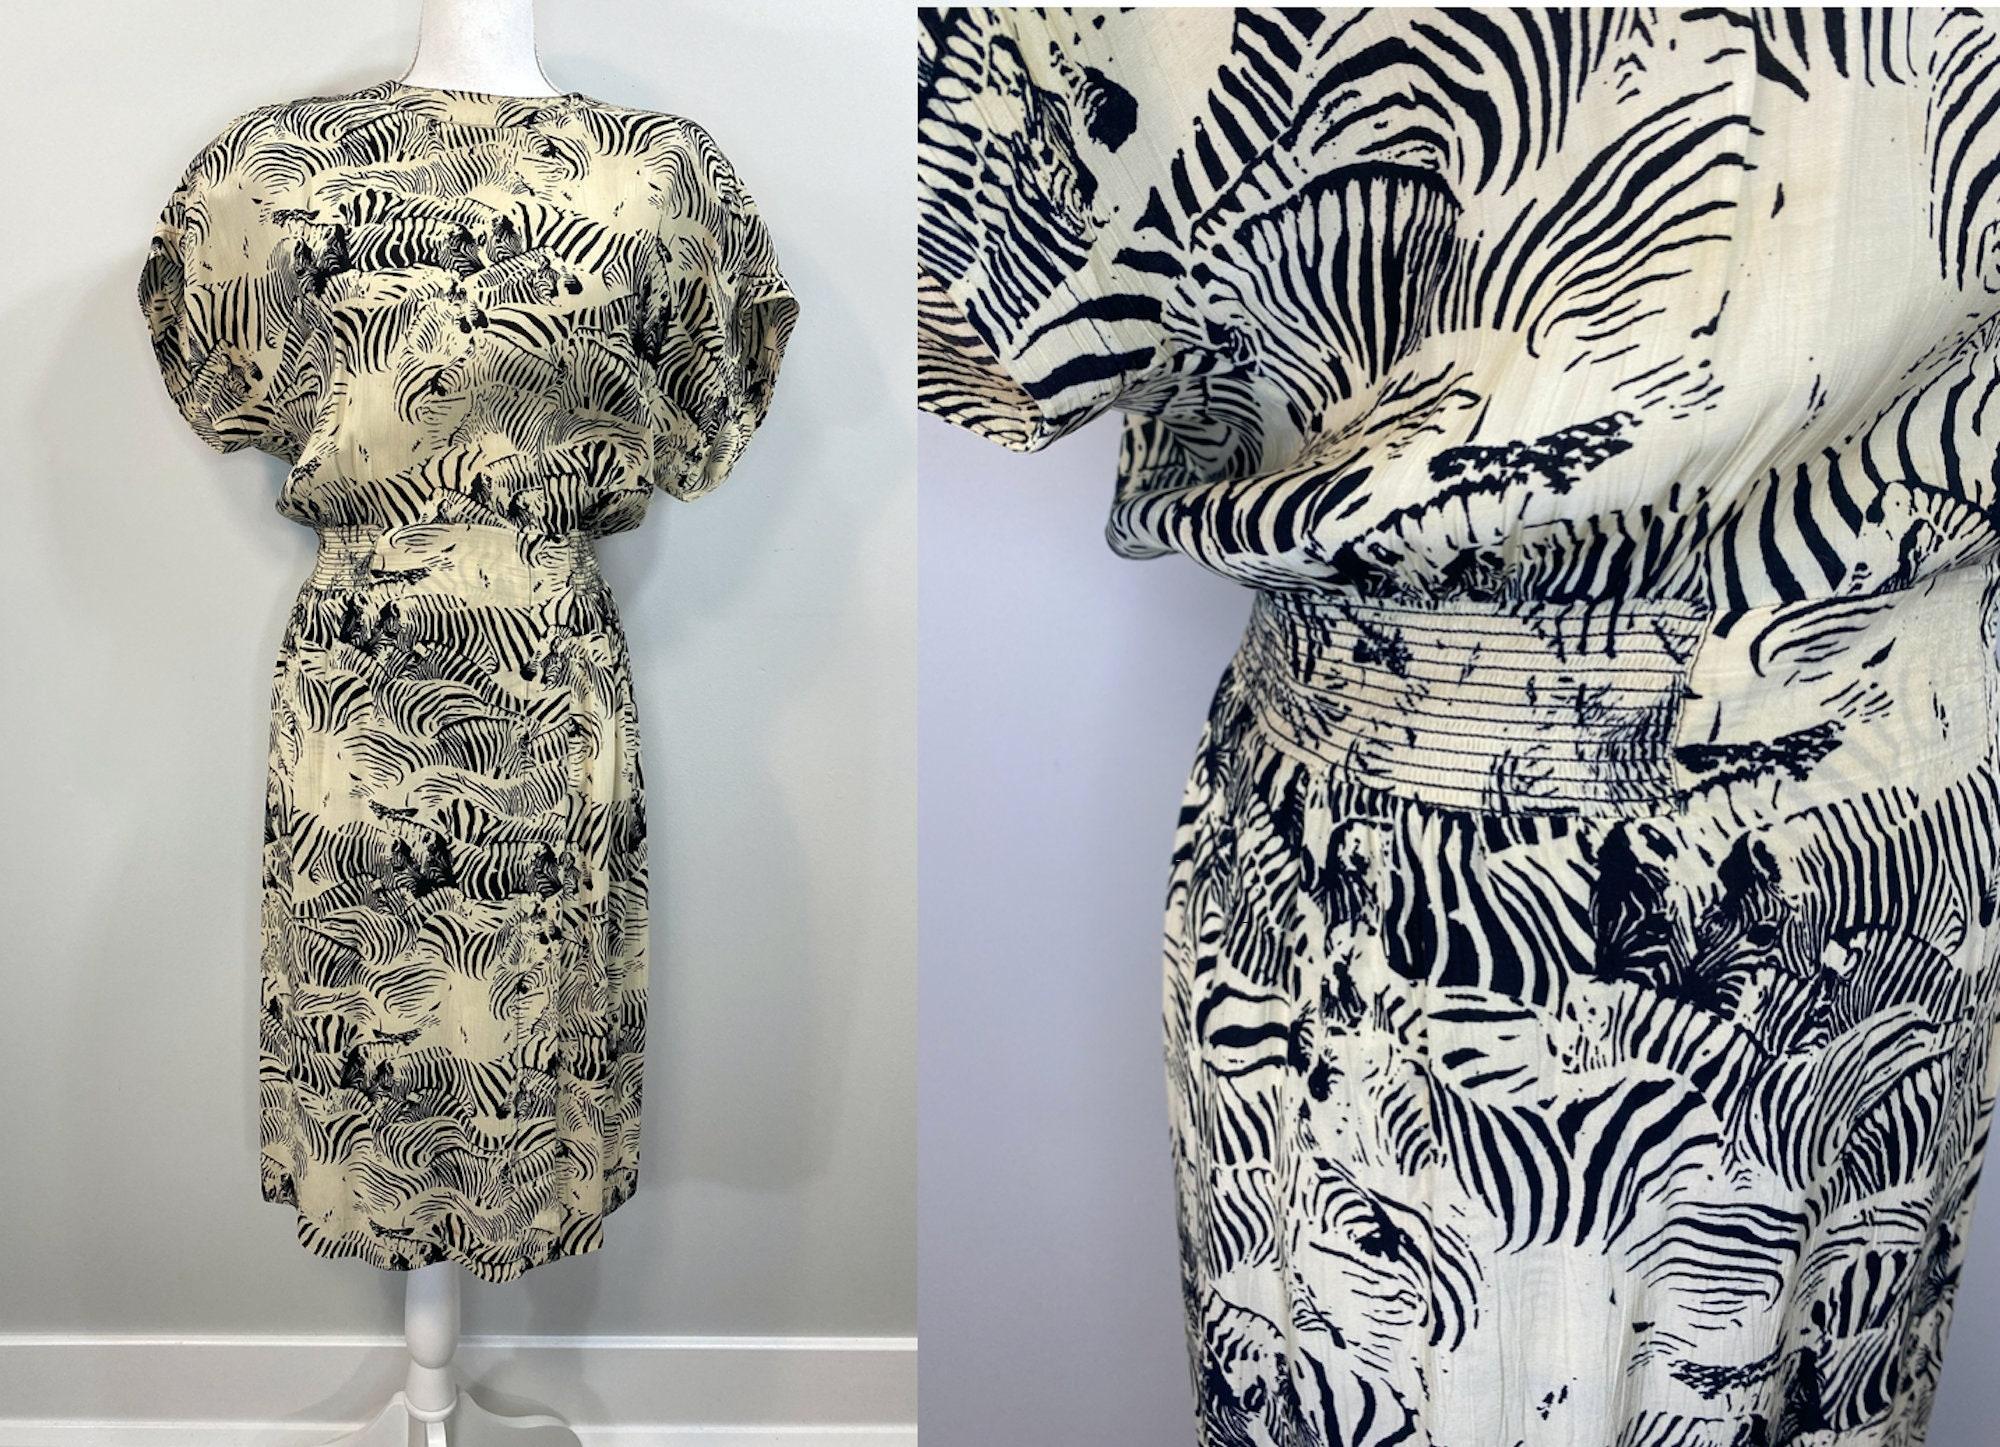 80s Dresses | Casual to Party Dresses Vintage 1980S Zebra Print Dress. Ivory Rayon With Print, Faux Wrap Skirt, Shoulder Pads. Elastic Smocked Waist. Liz Claiborne $0.00 AT vintagedancer.com